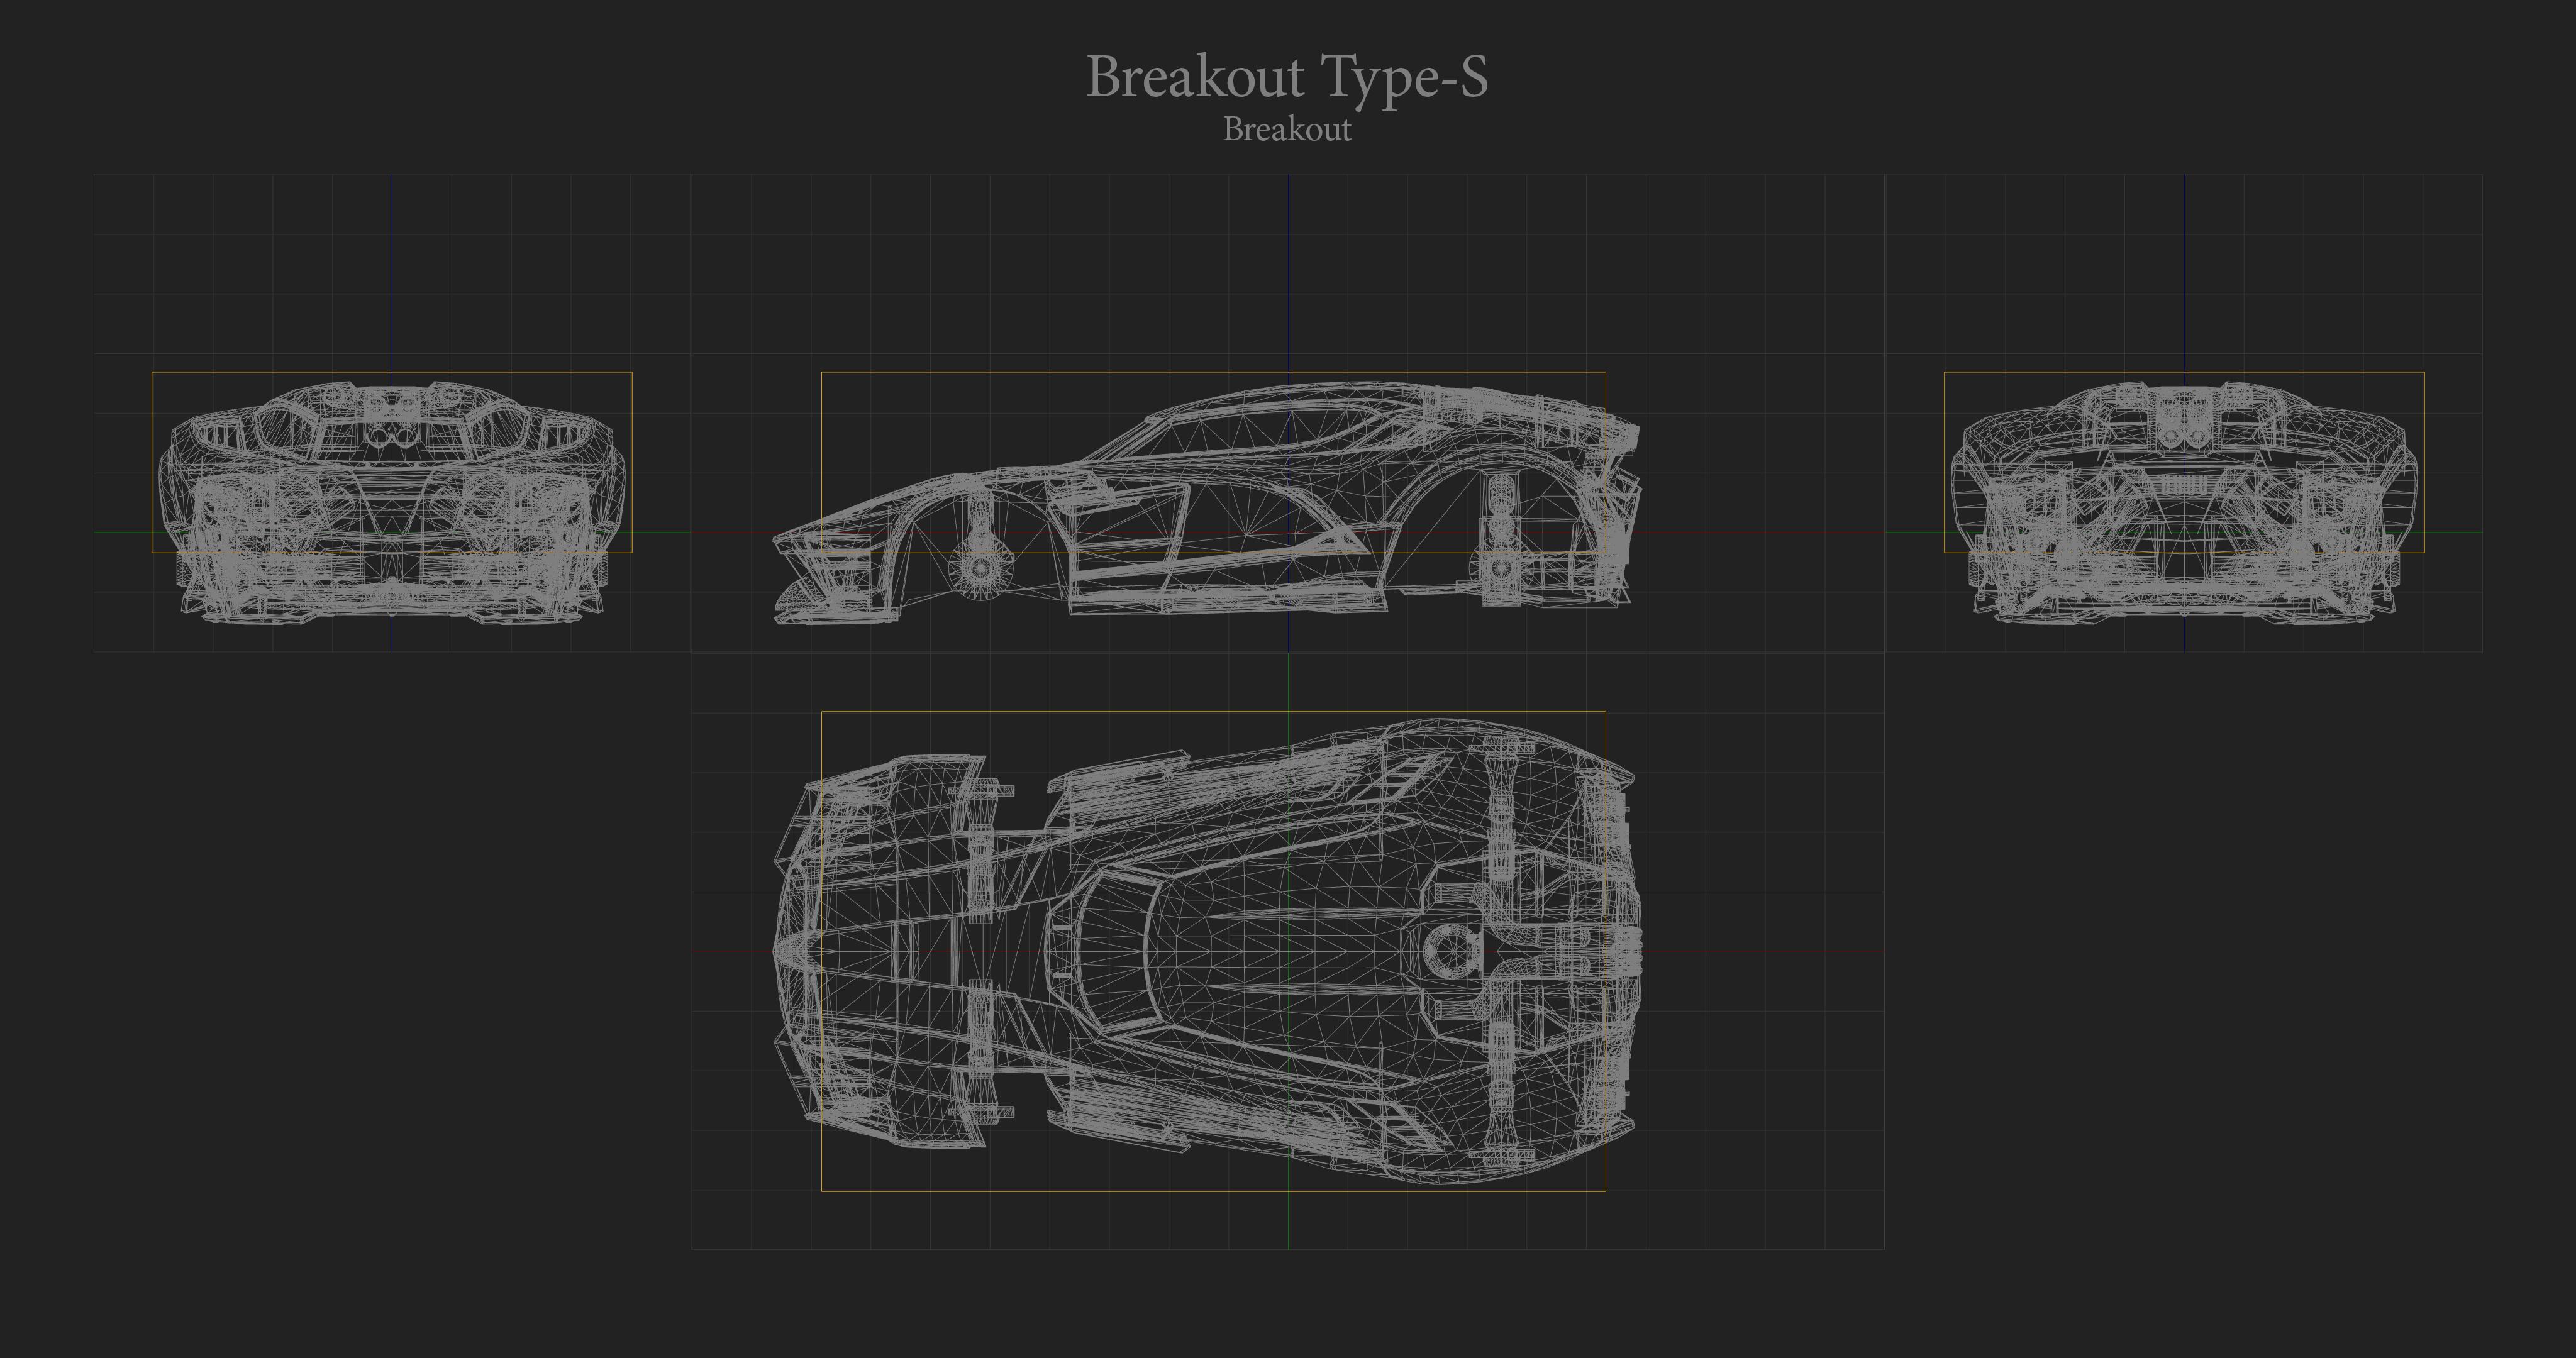 Breakout Type S Hitbox Rocket League